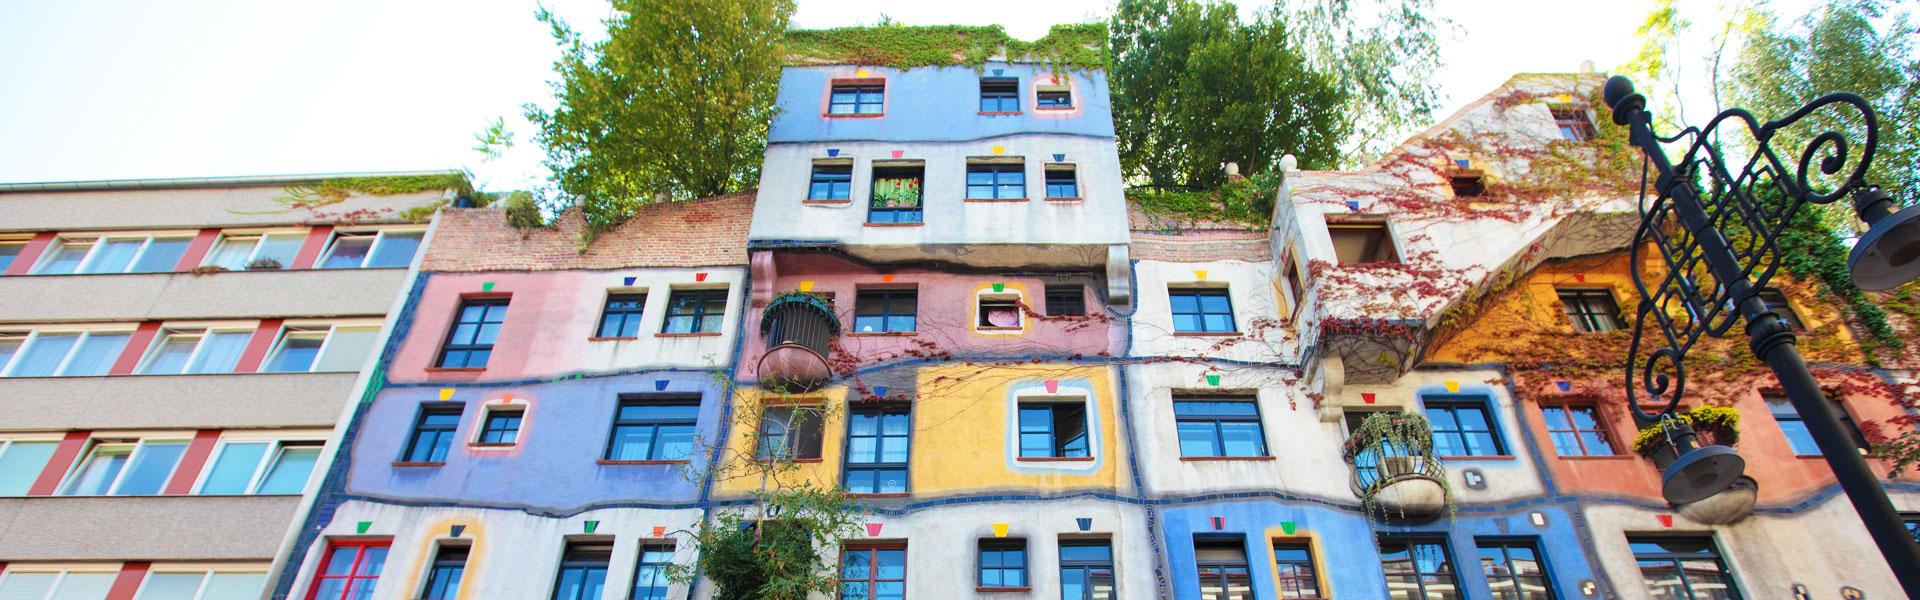 View of Hundertwasser House Vienna